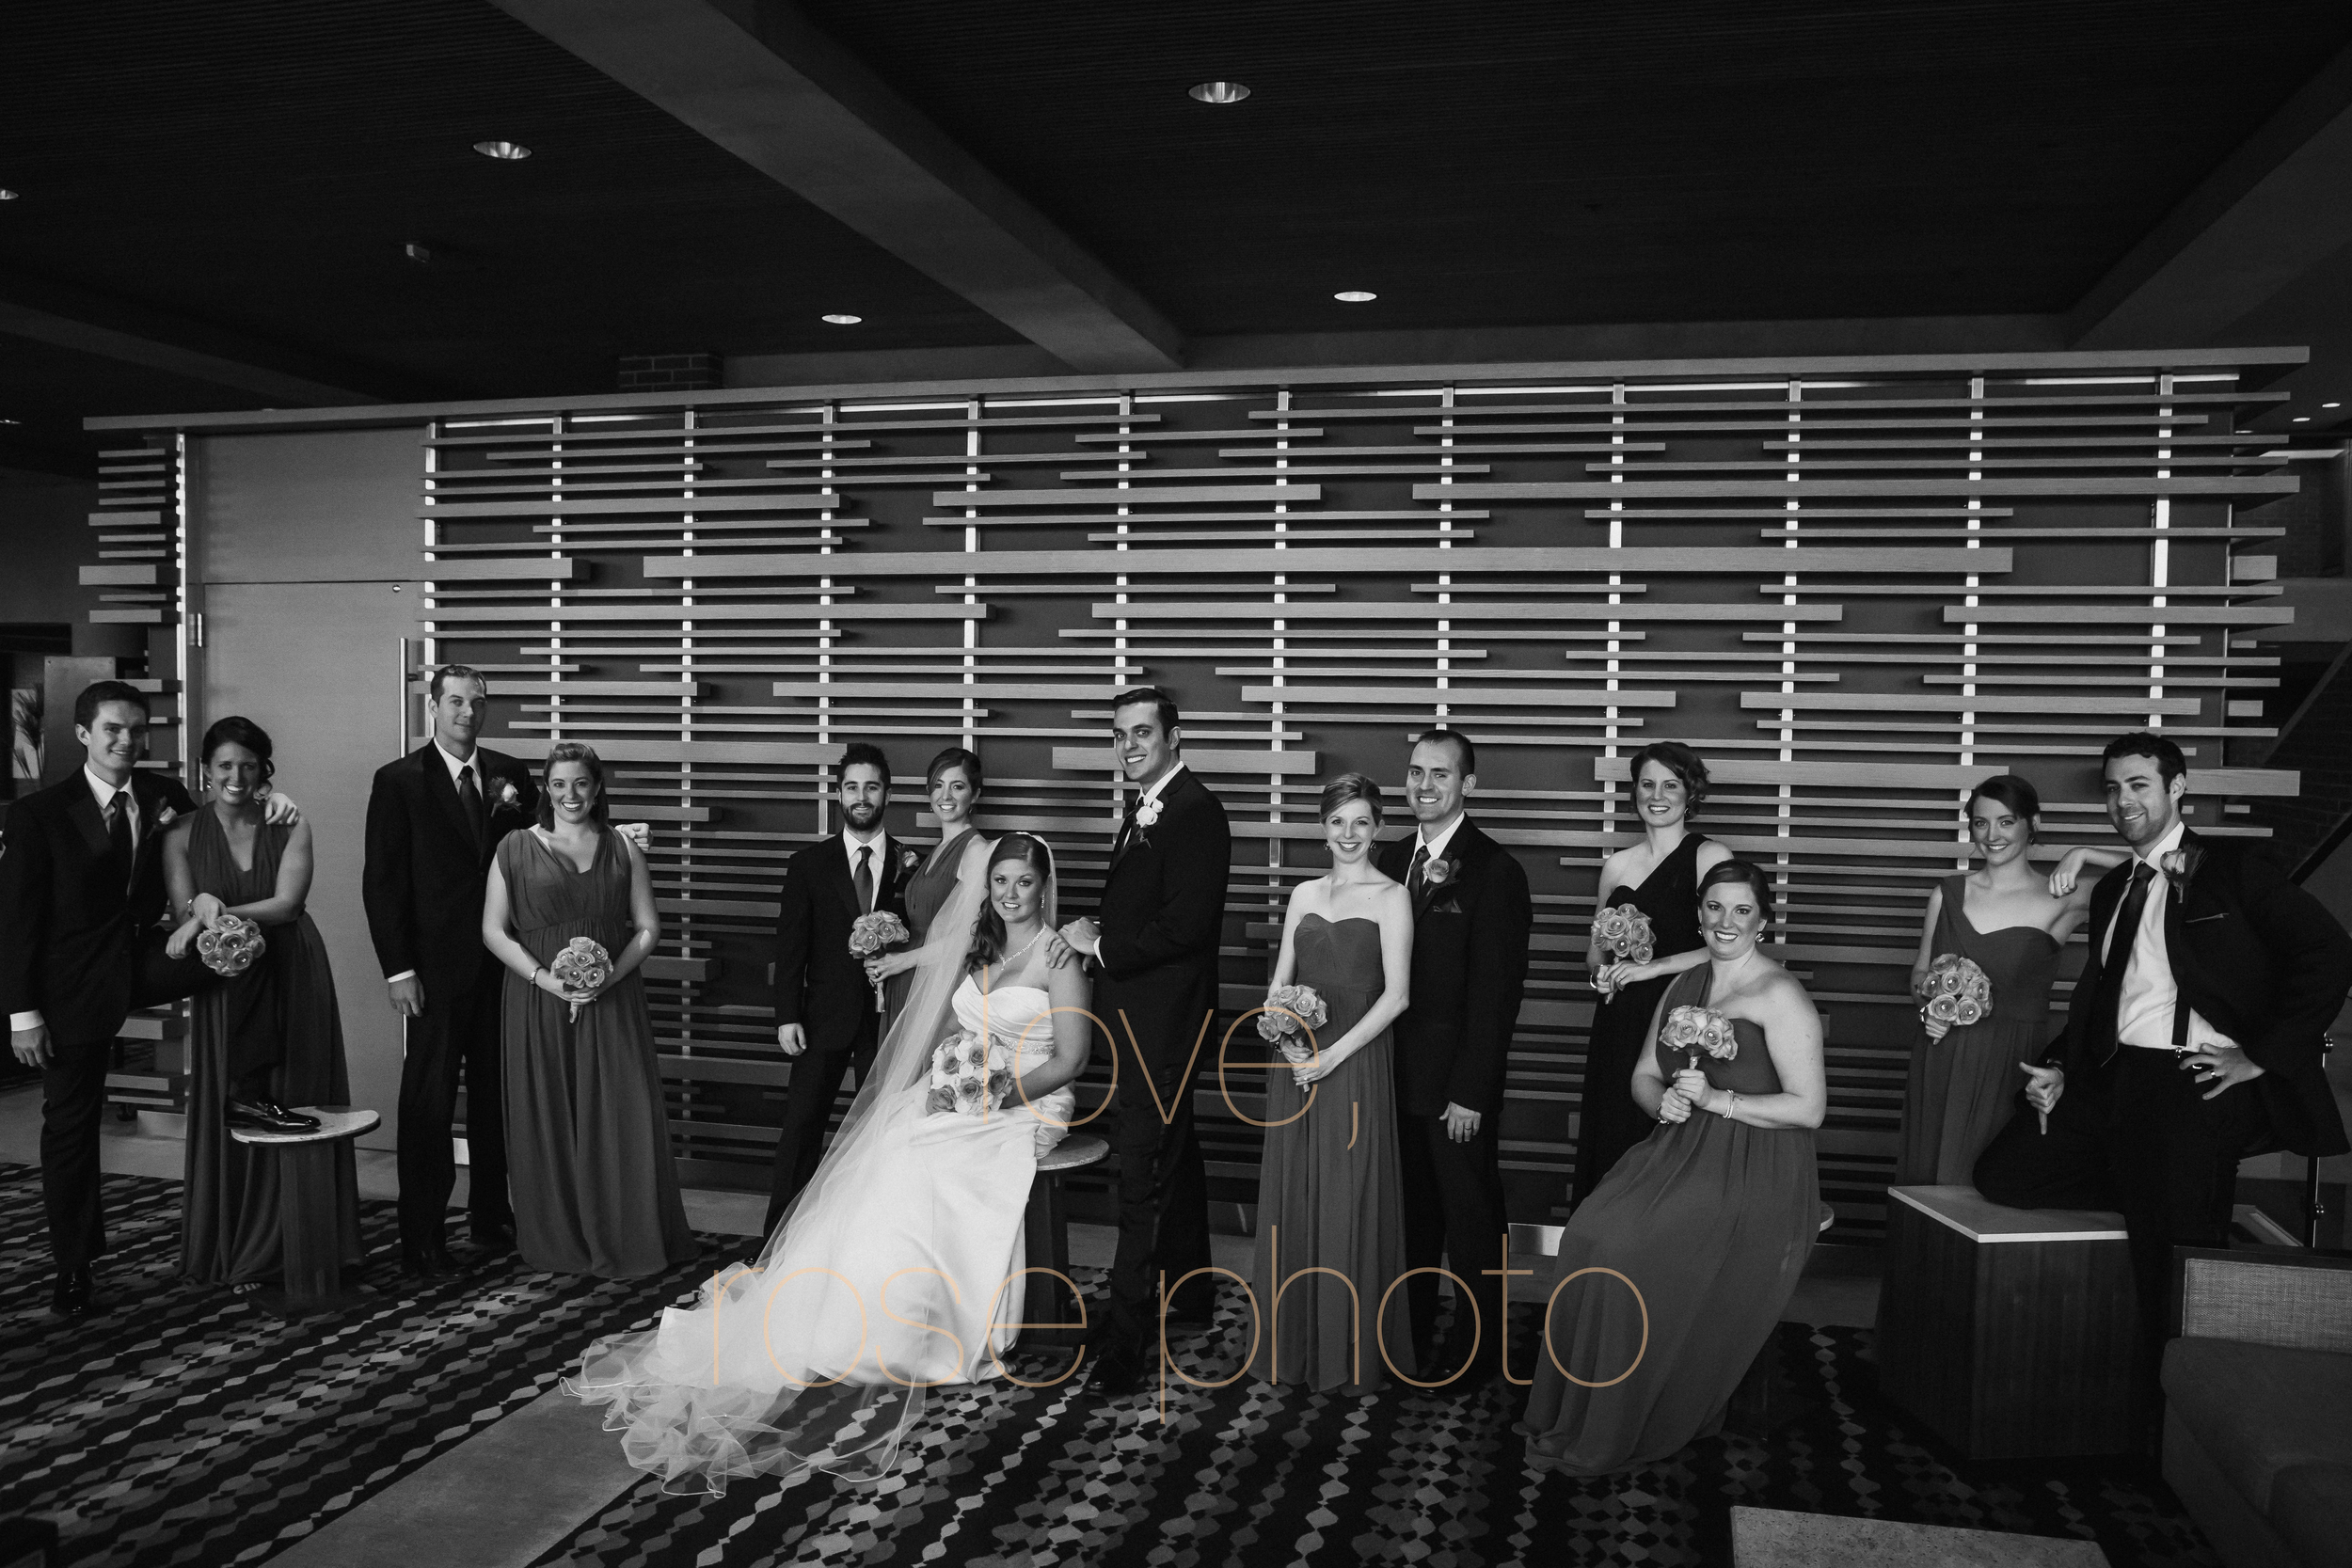 katie + even new years eve chicago oak brook mcdonalds lodge 2014 polish wedding balloon drop champagne-006.jpg